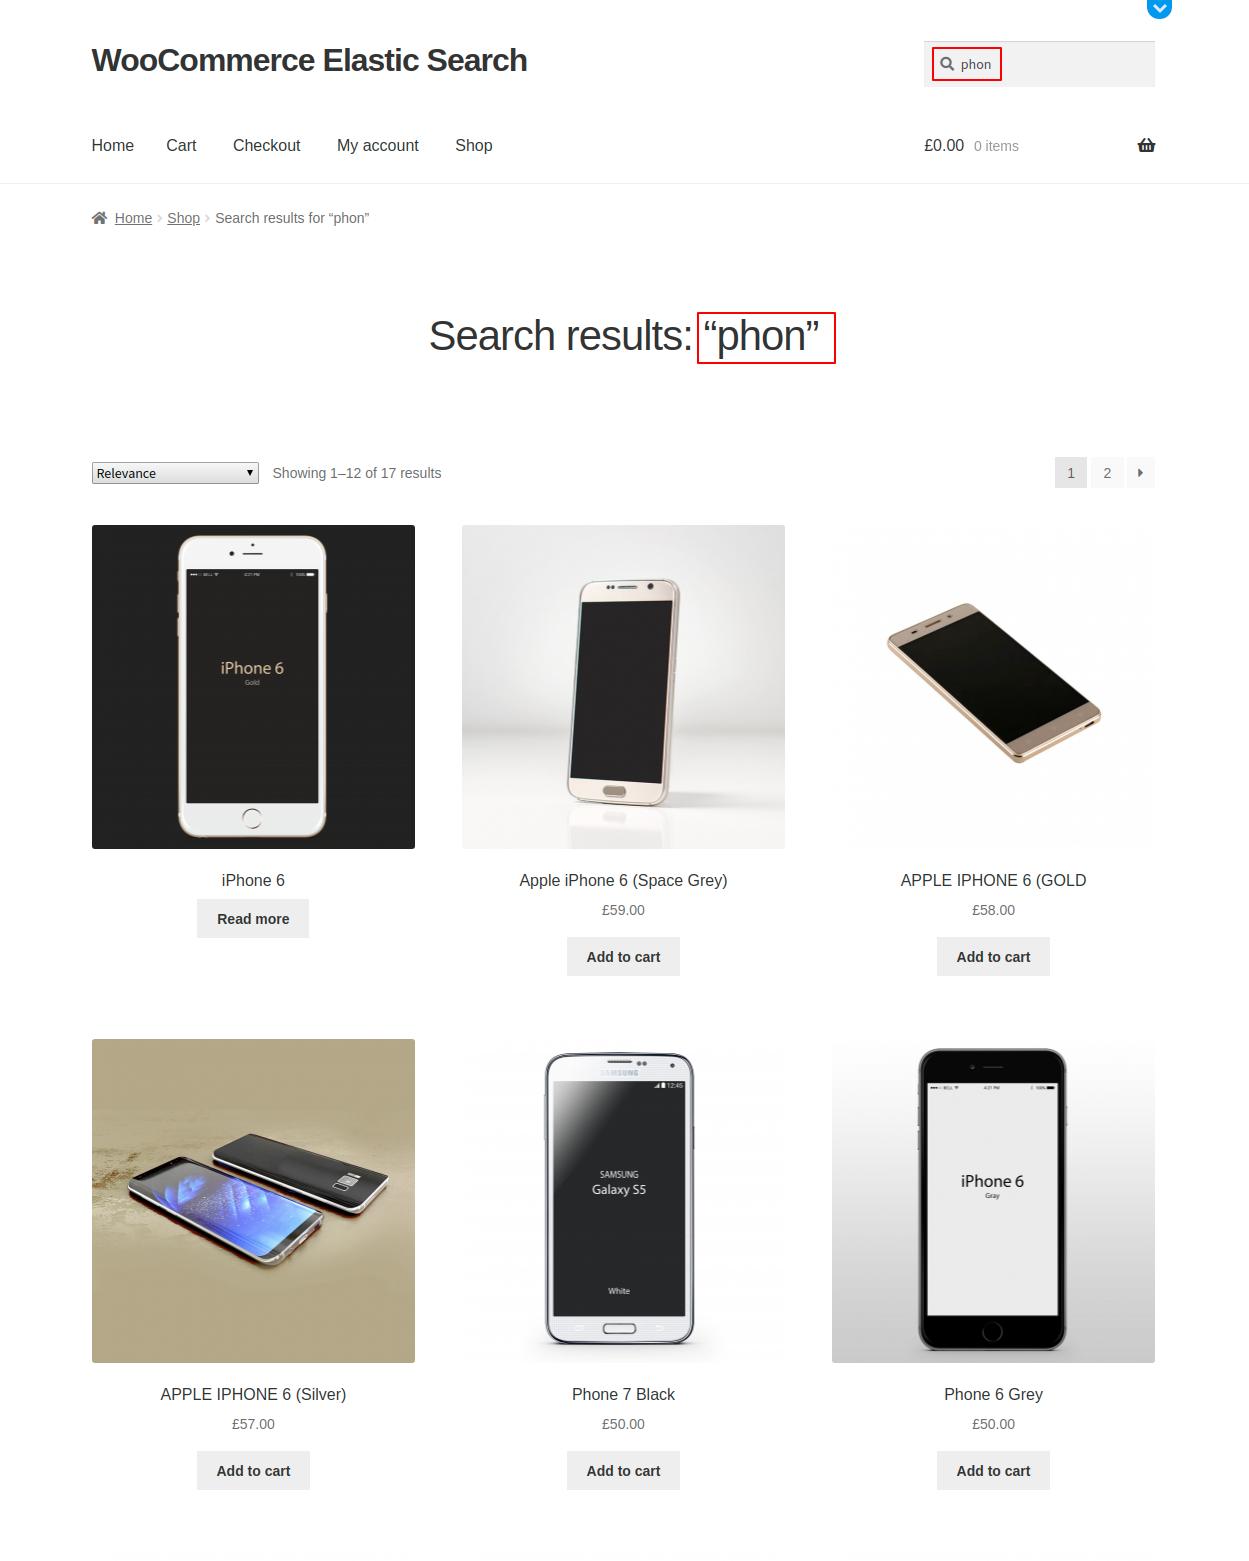 webkul-woocommerce-elasticsearch-search-results-customer-end-1